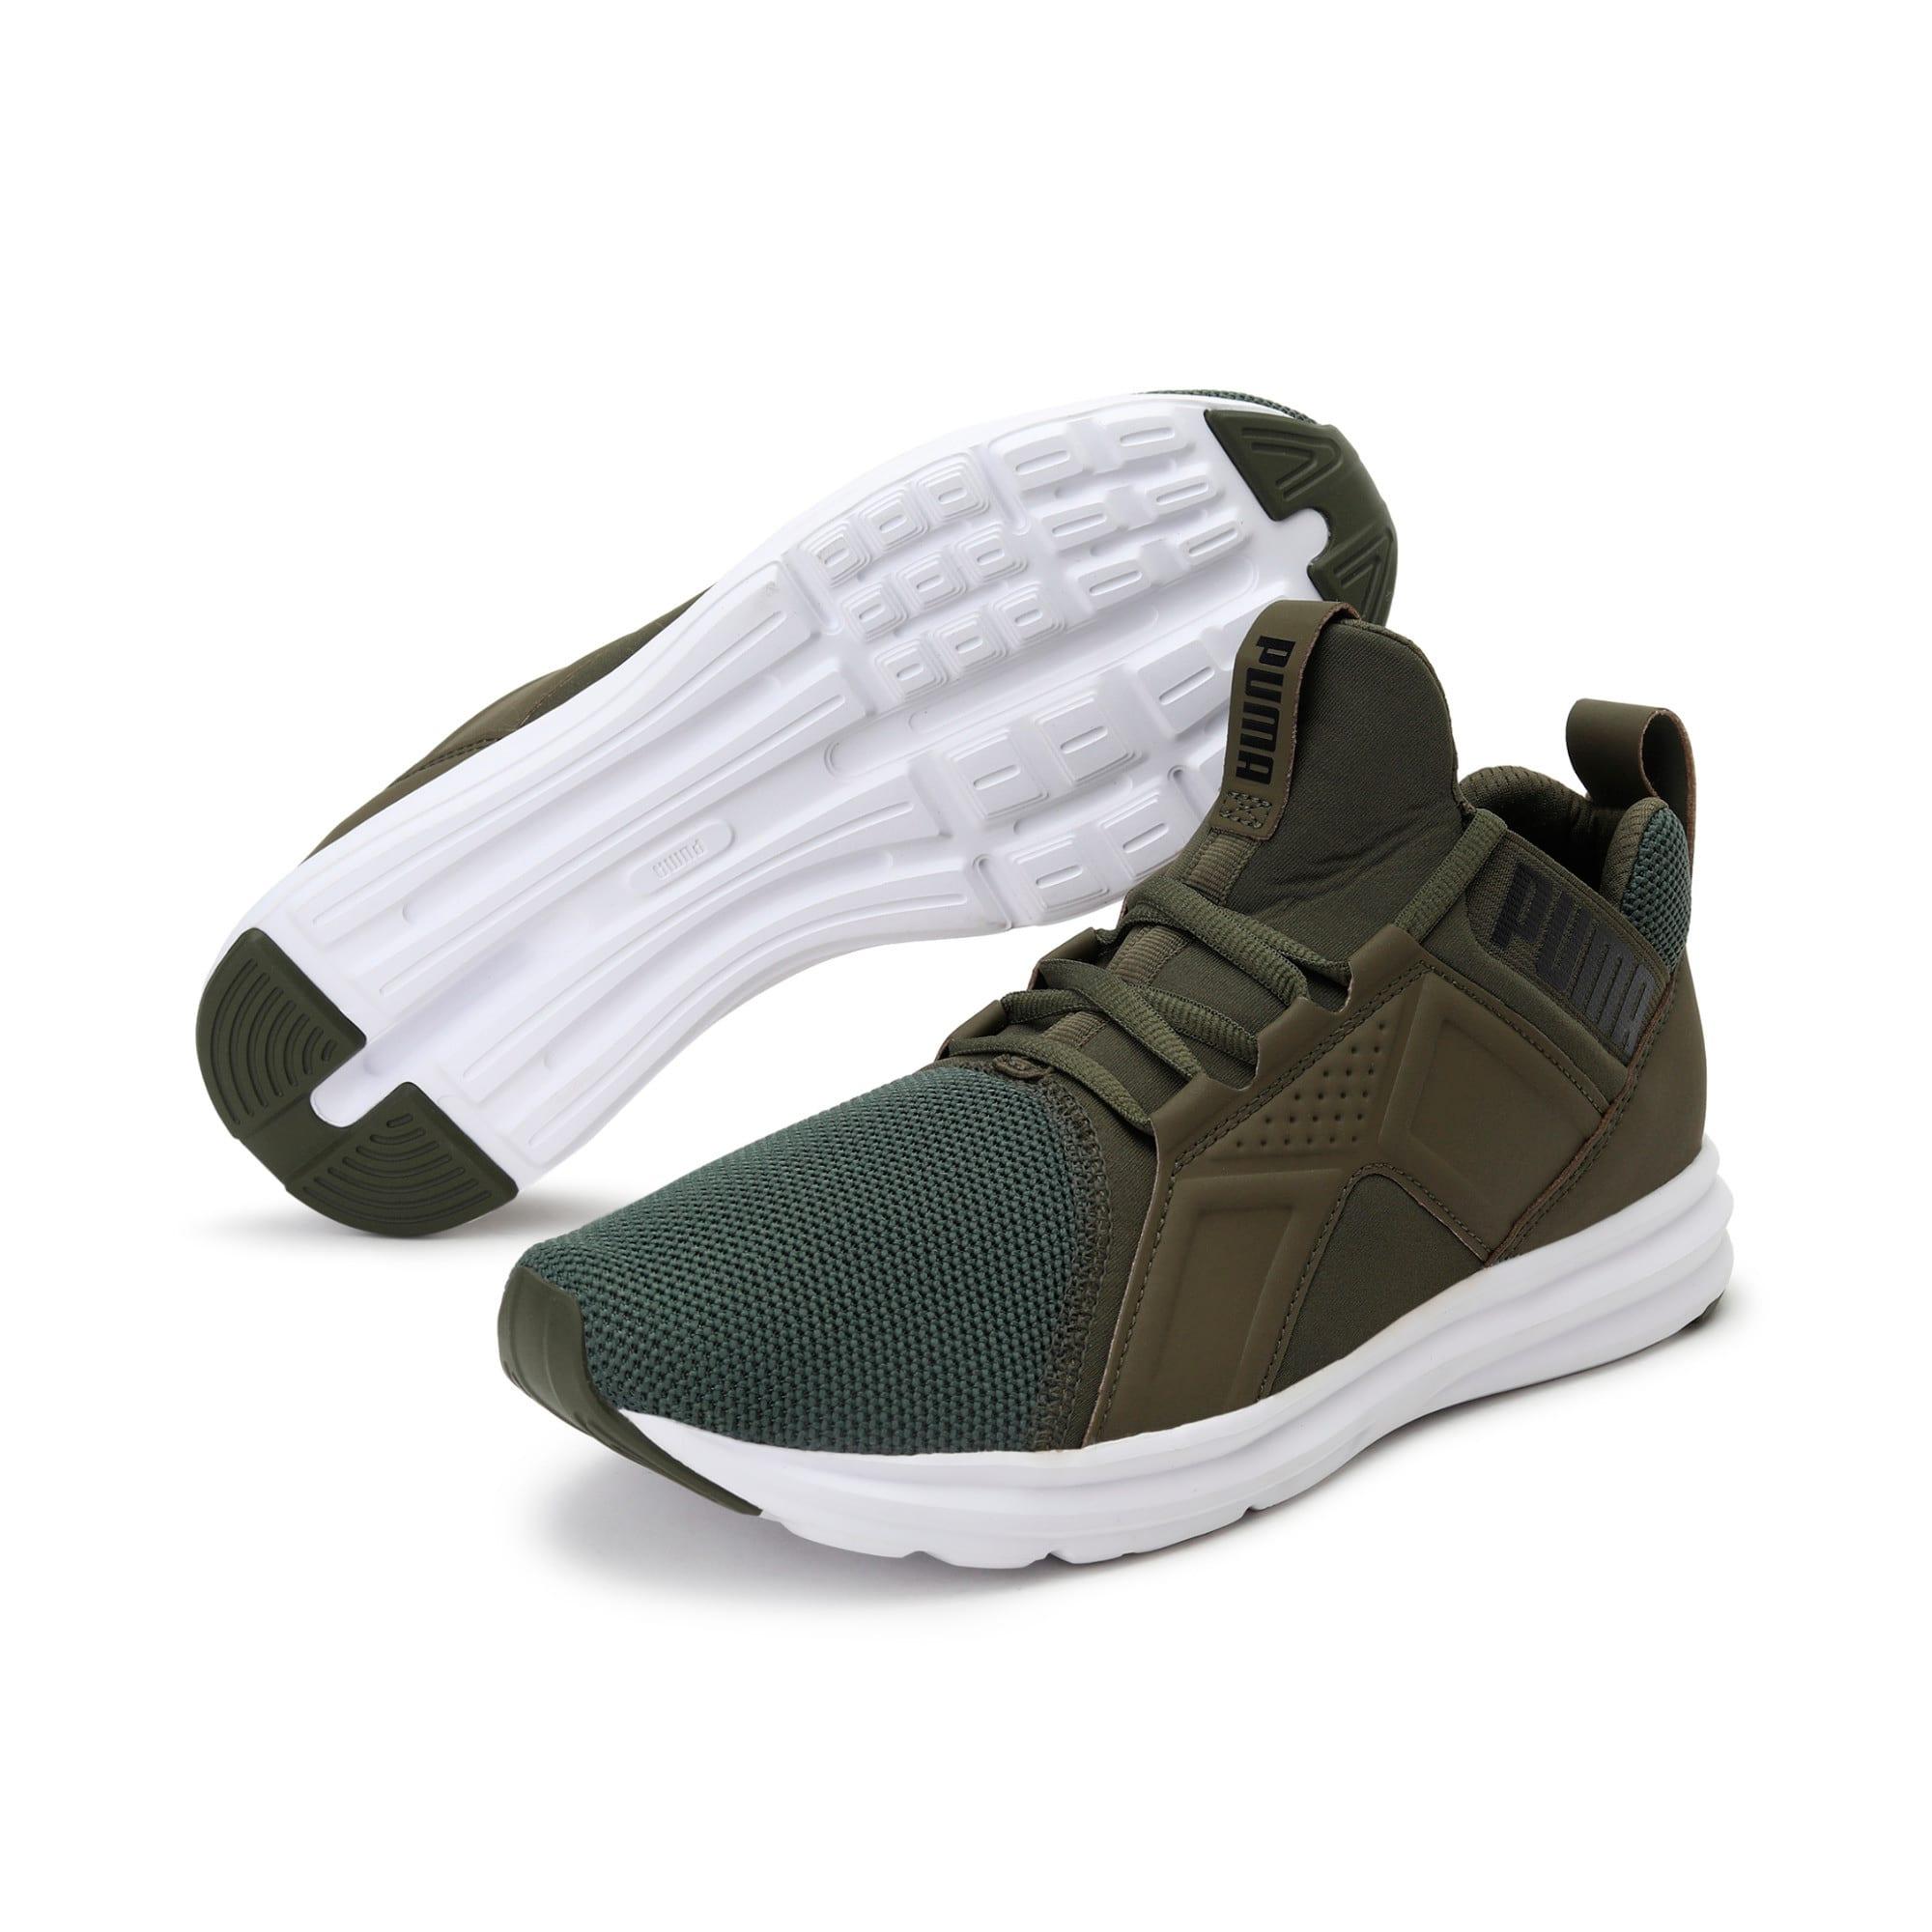 Thumbnail 2 of Enzo Mesh Men's Running Shoes, Olive Night-Puma White, medium-IND